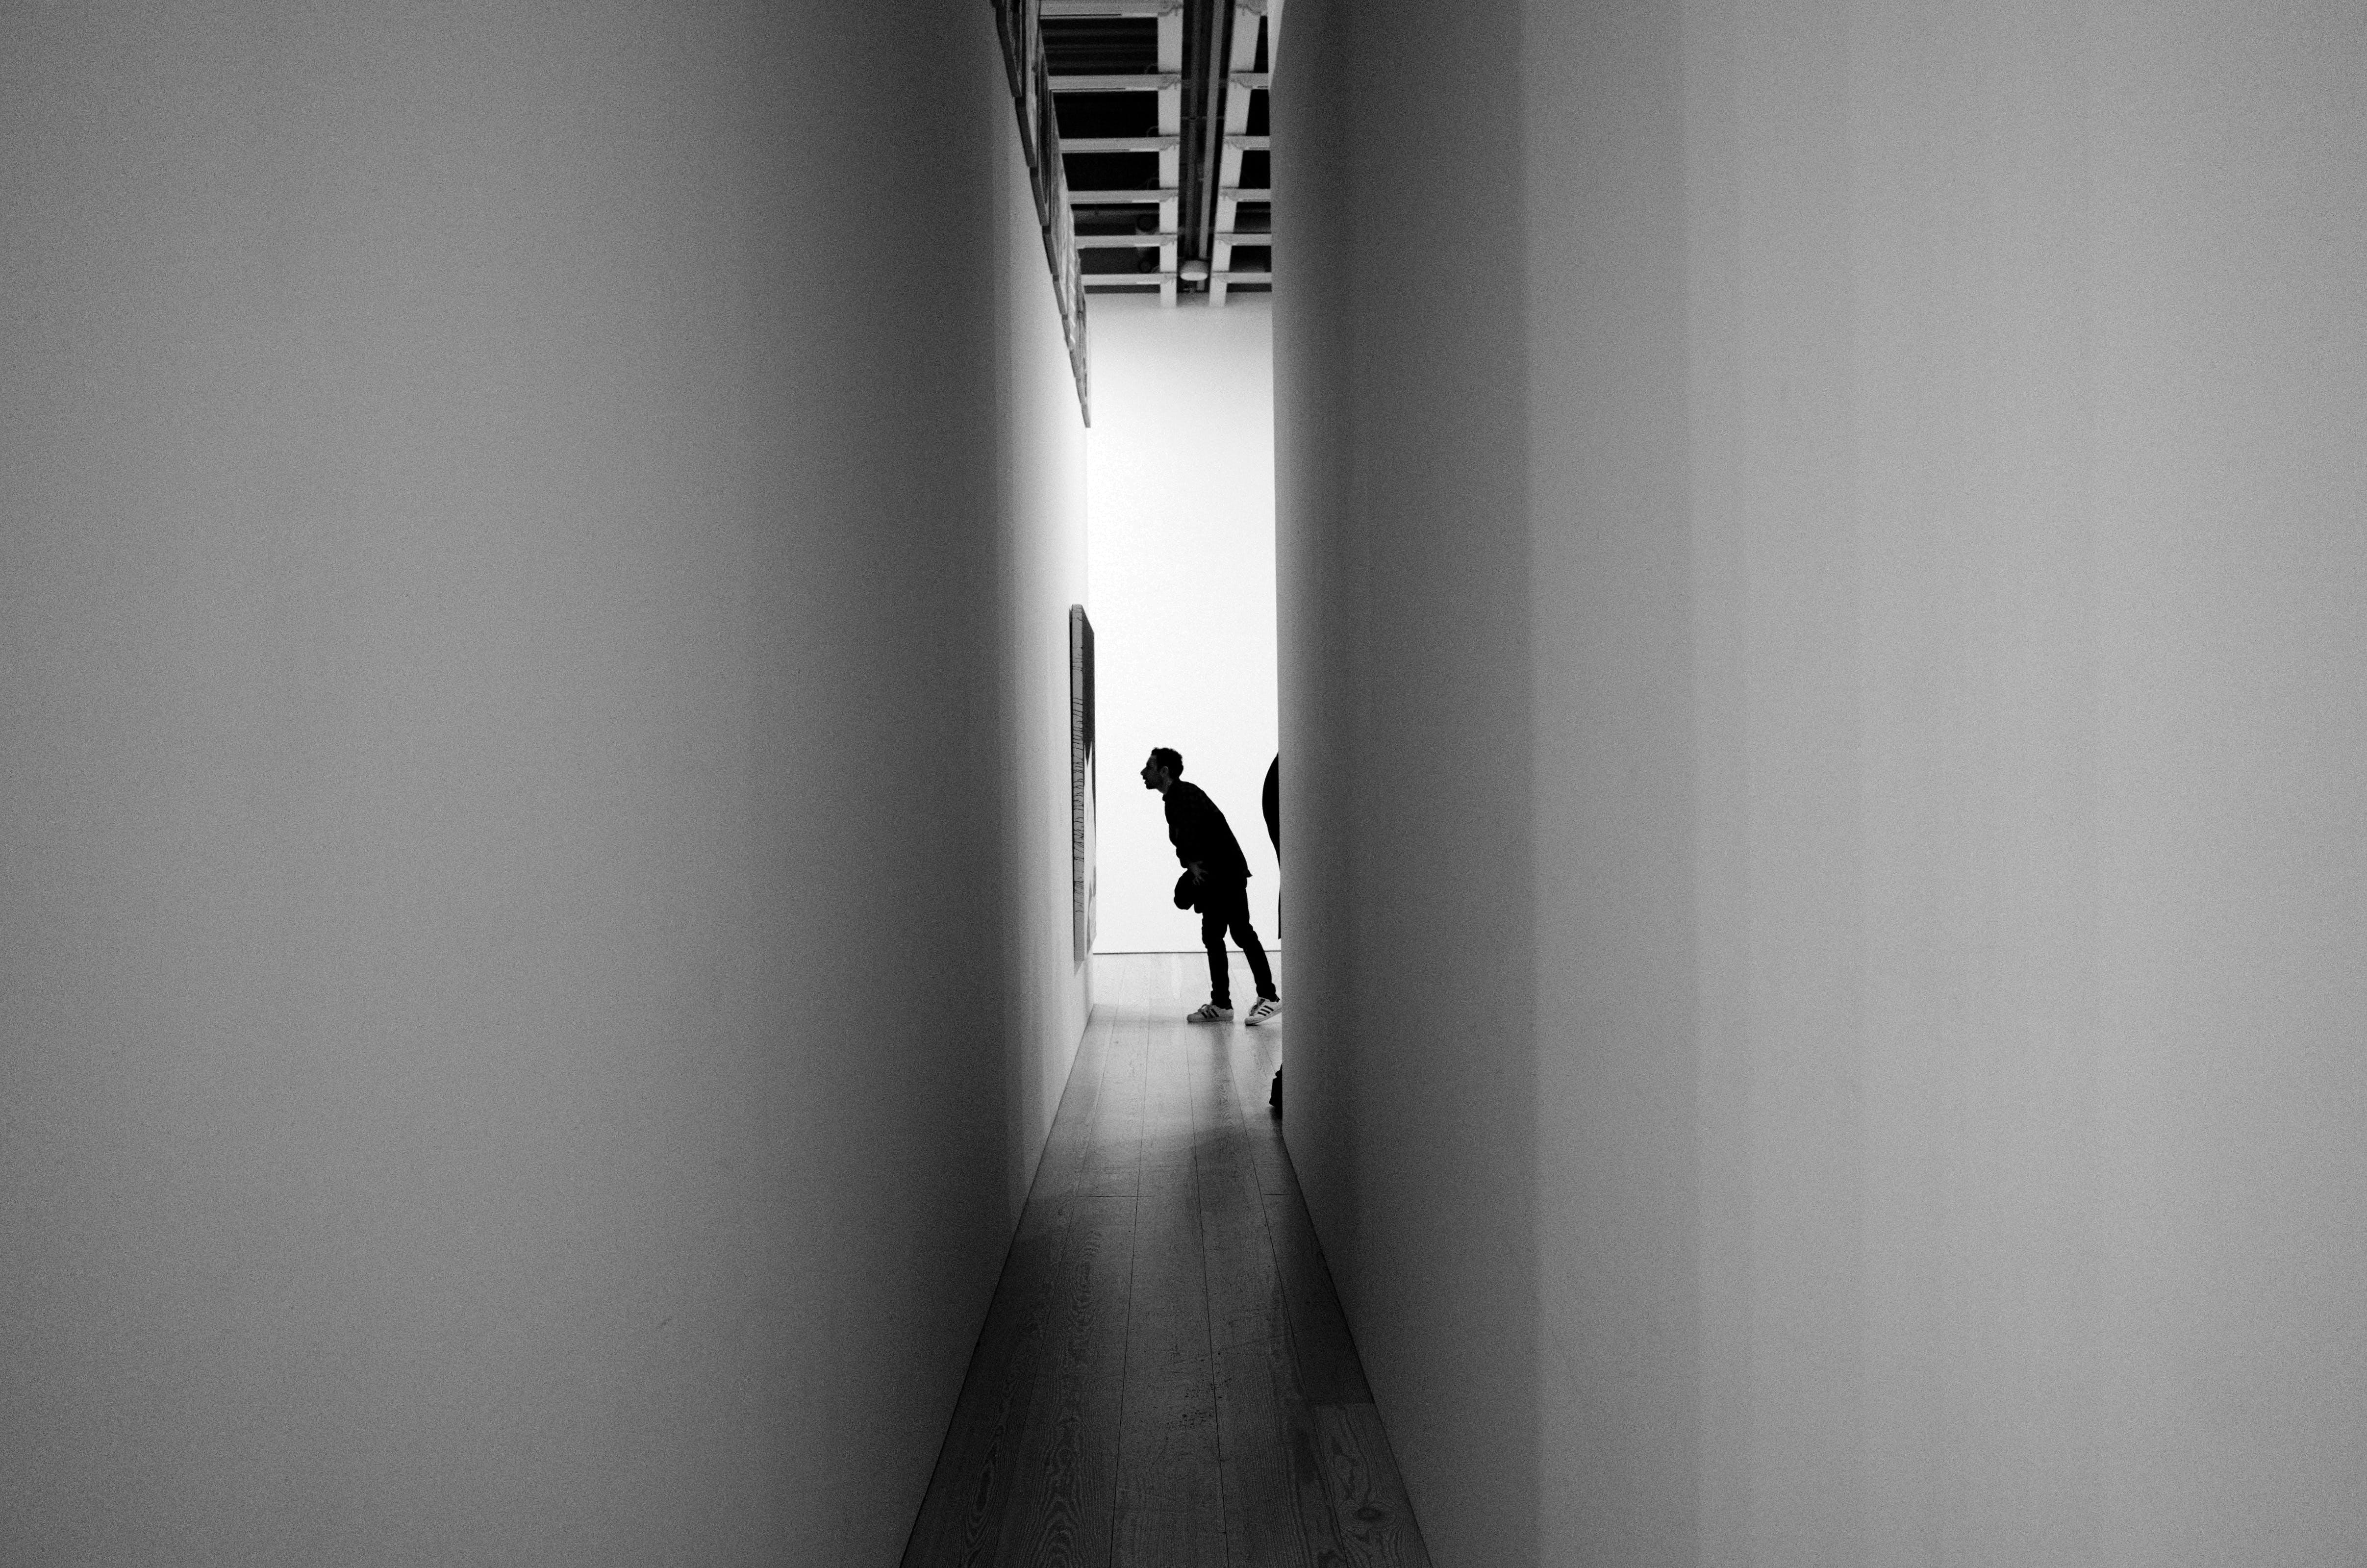 Free stock photo of minimalism, minimalist